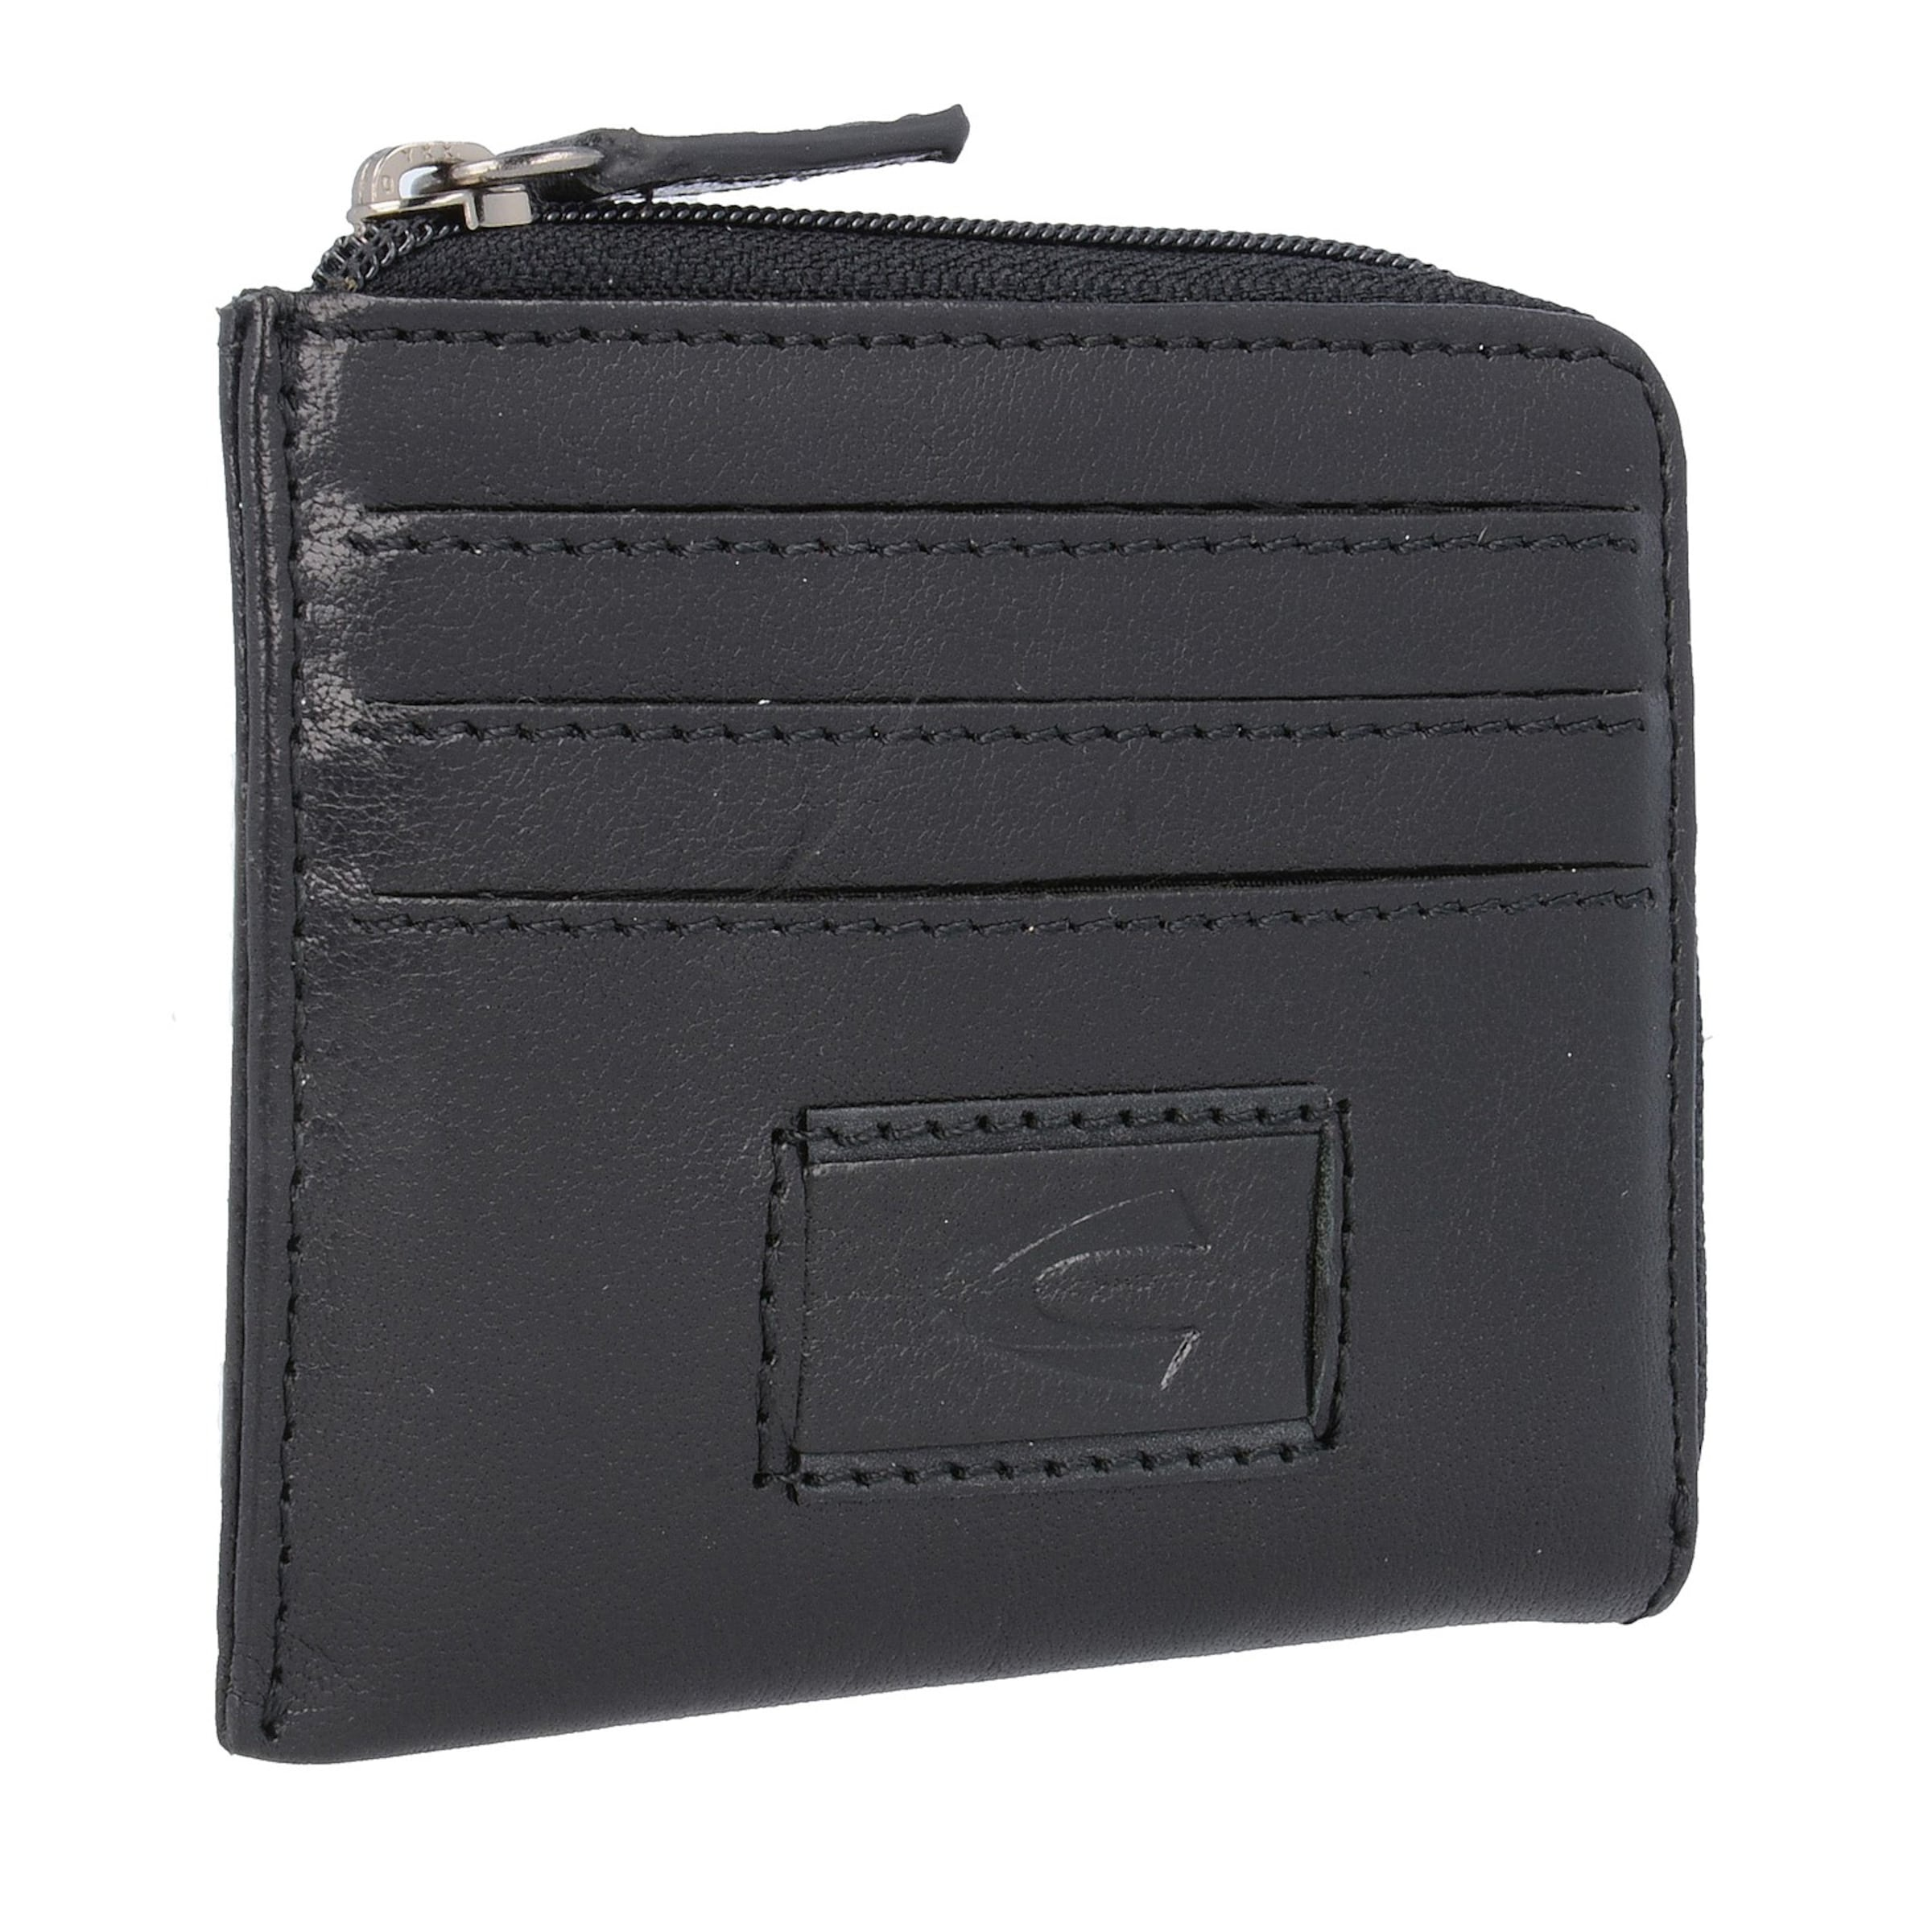 CAMEL ACTIVE Kreditkartenetui 'Panama', Leder, 10 cm